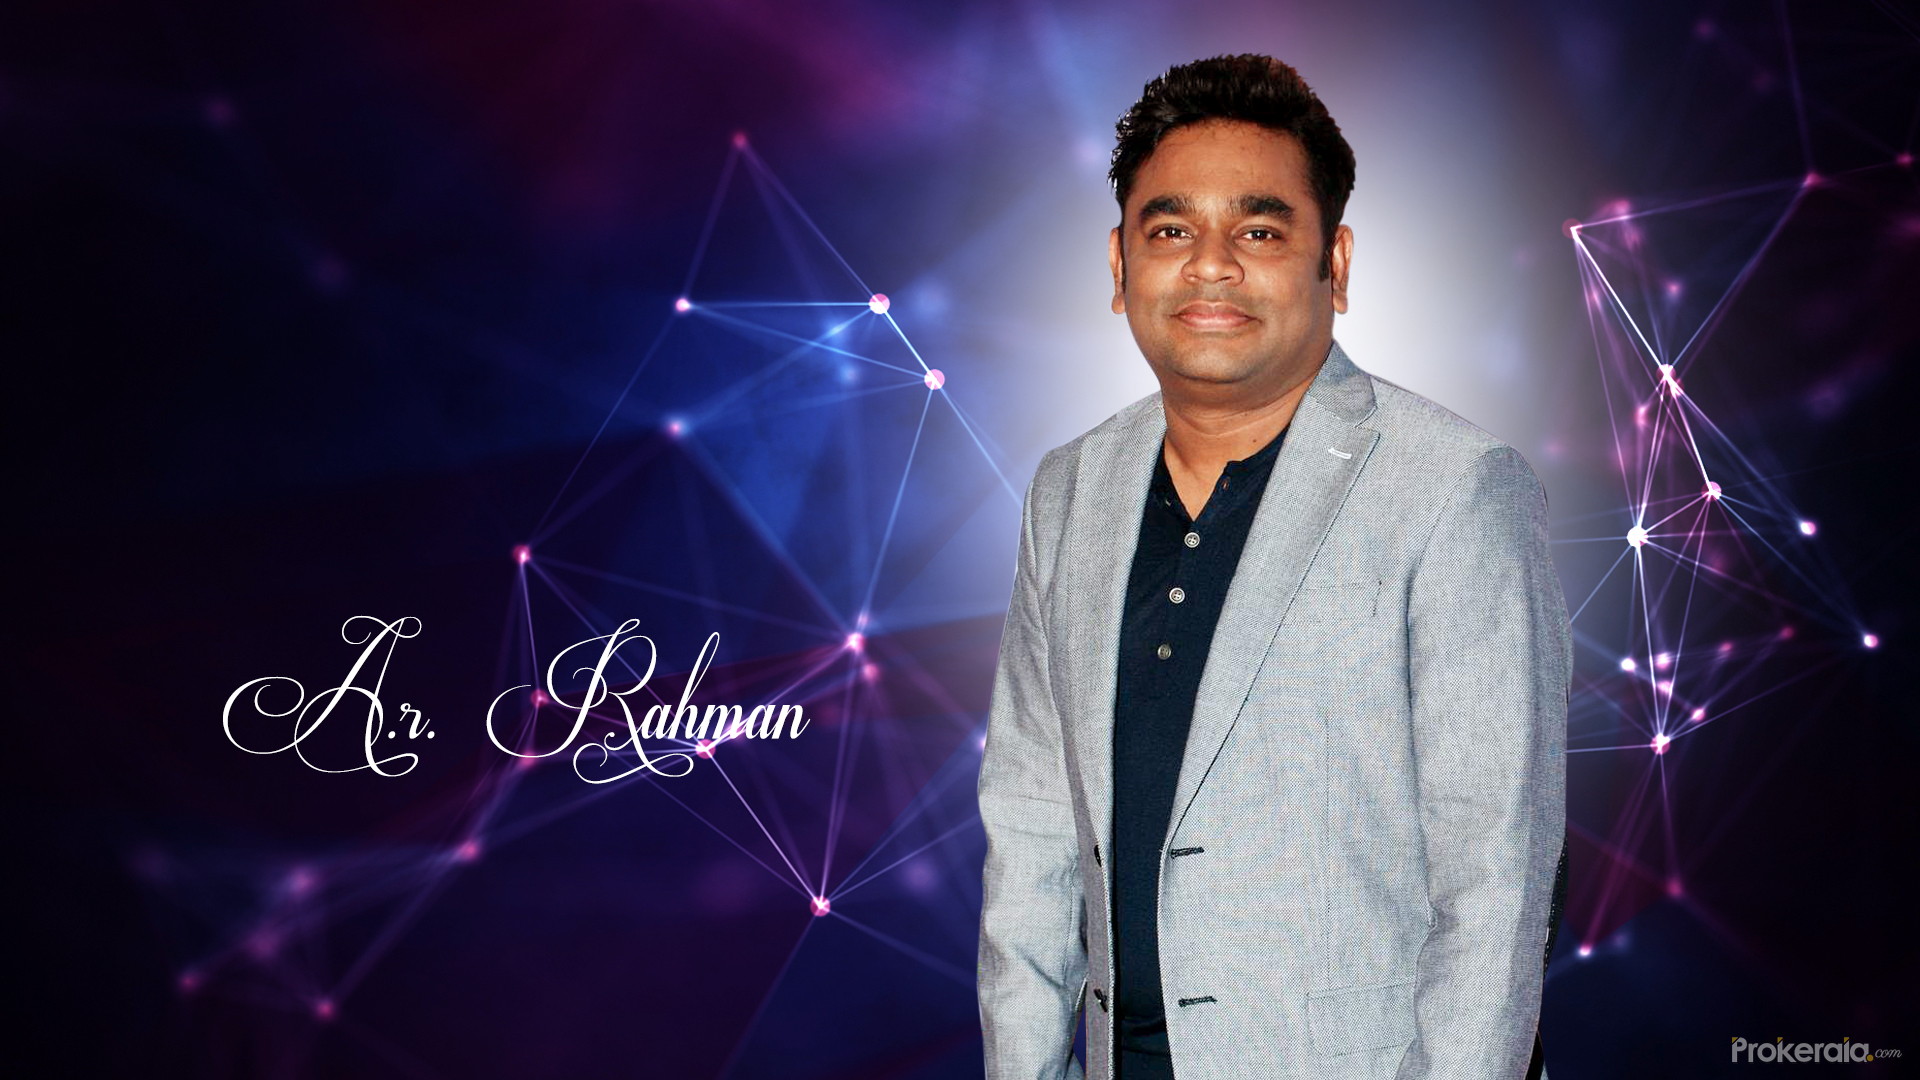 Download A.R.Rahman Wallpaper # 1